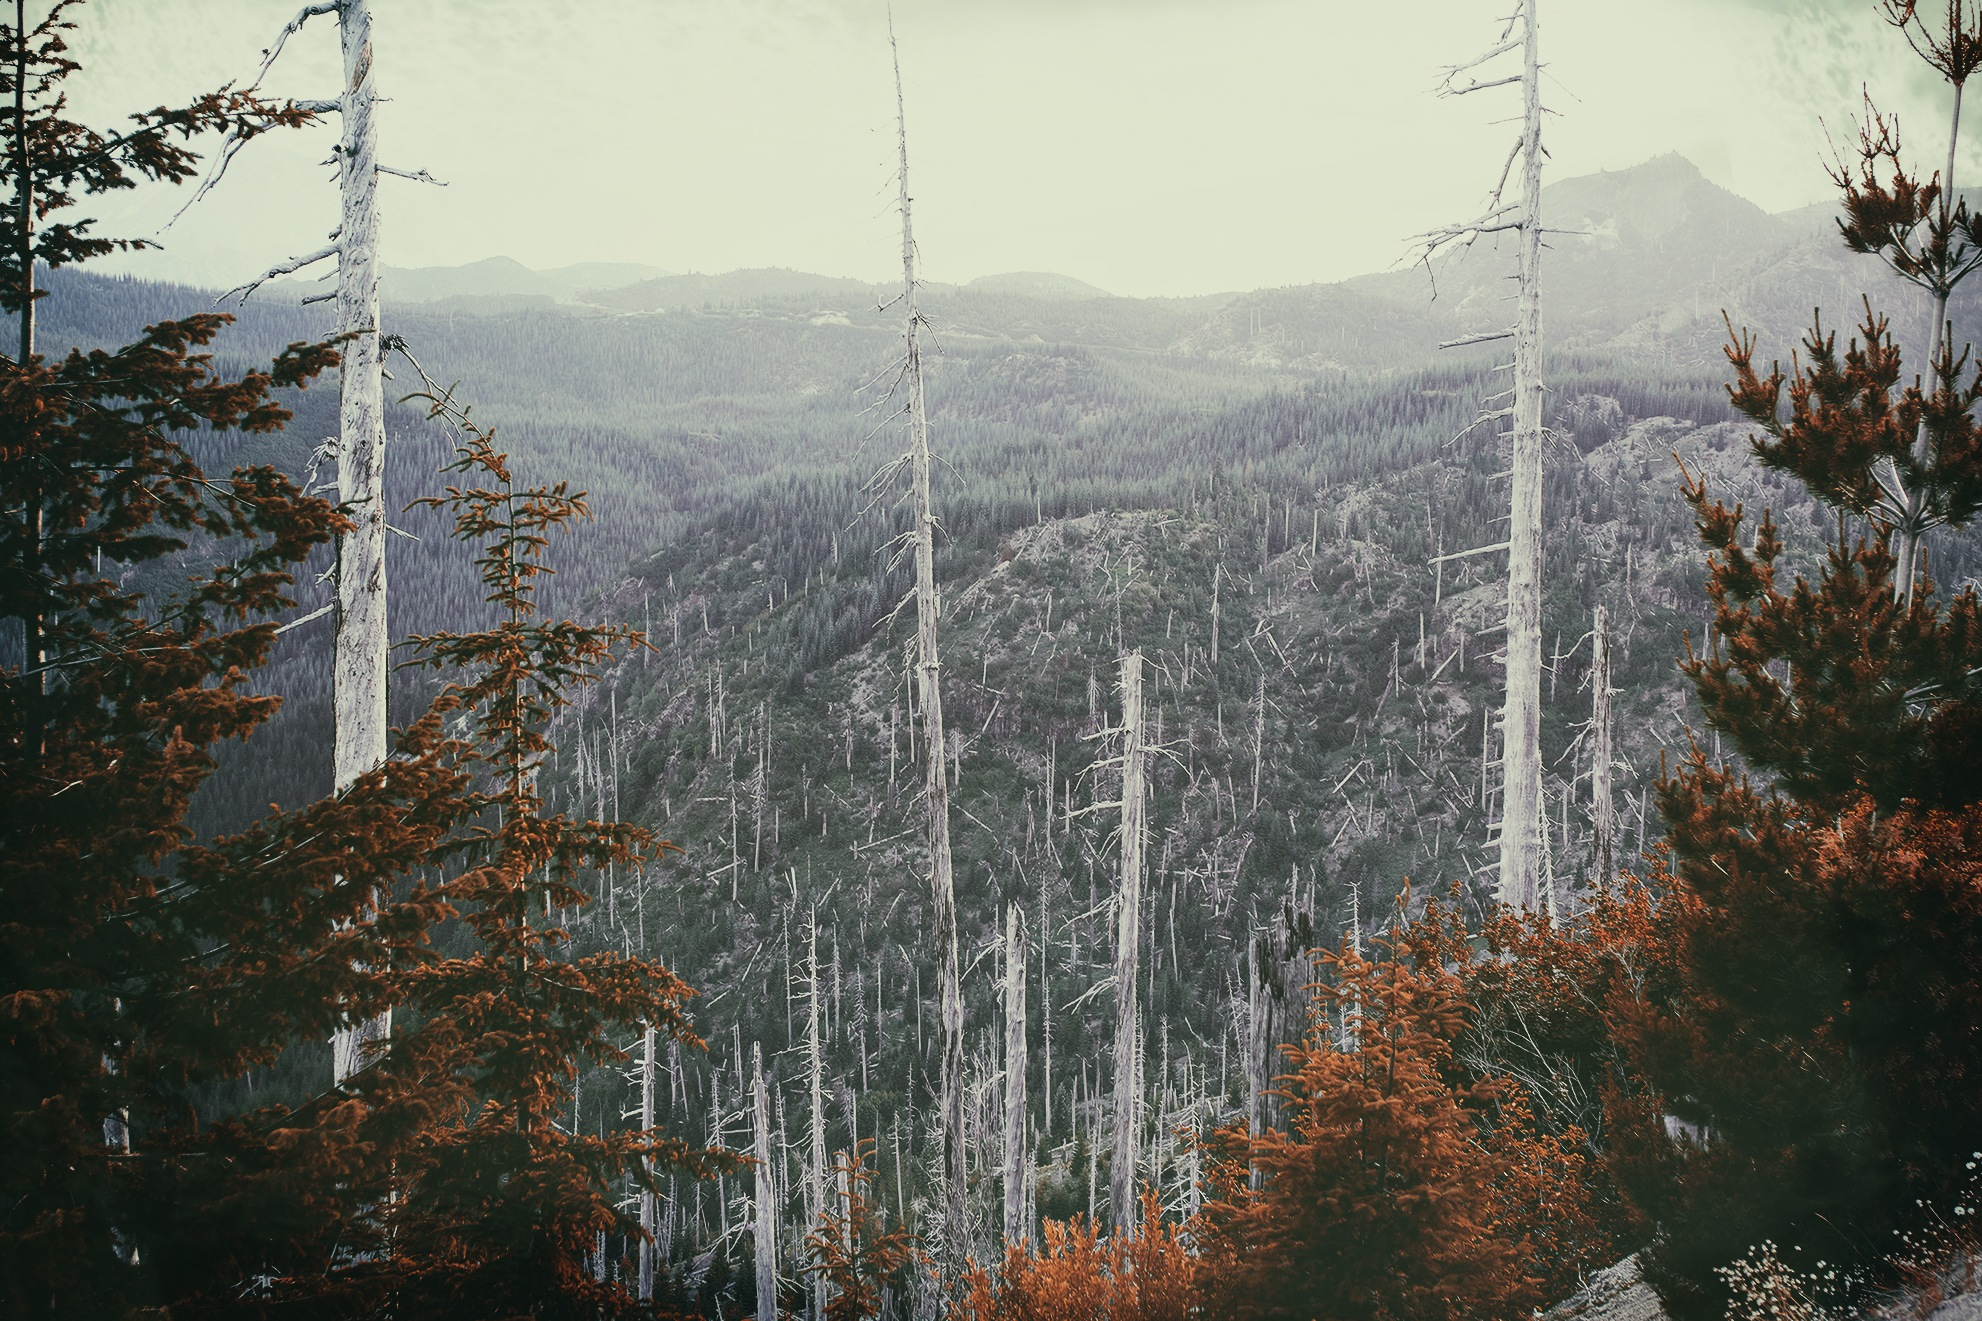 Destroyed Forest 1980 Mt. St. Helens Eruption by shanetzu